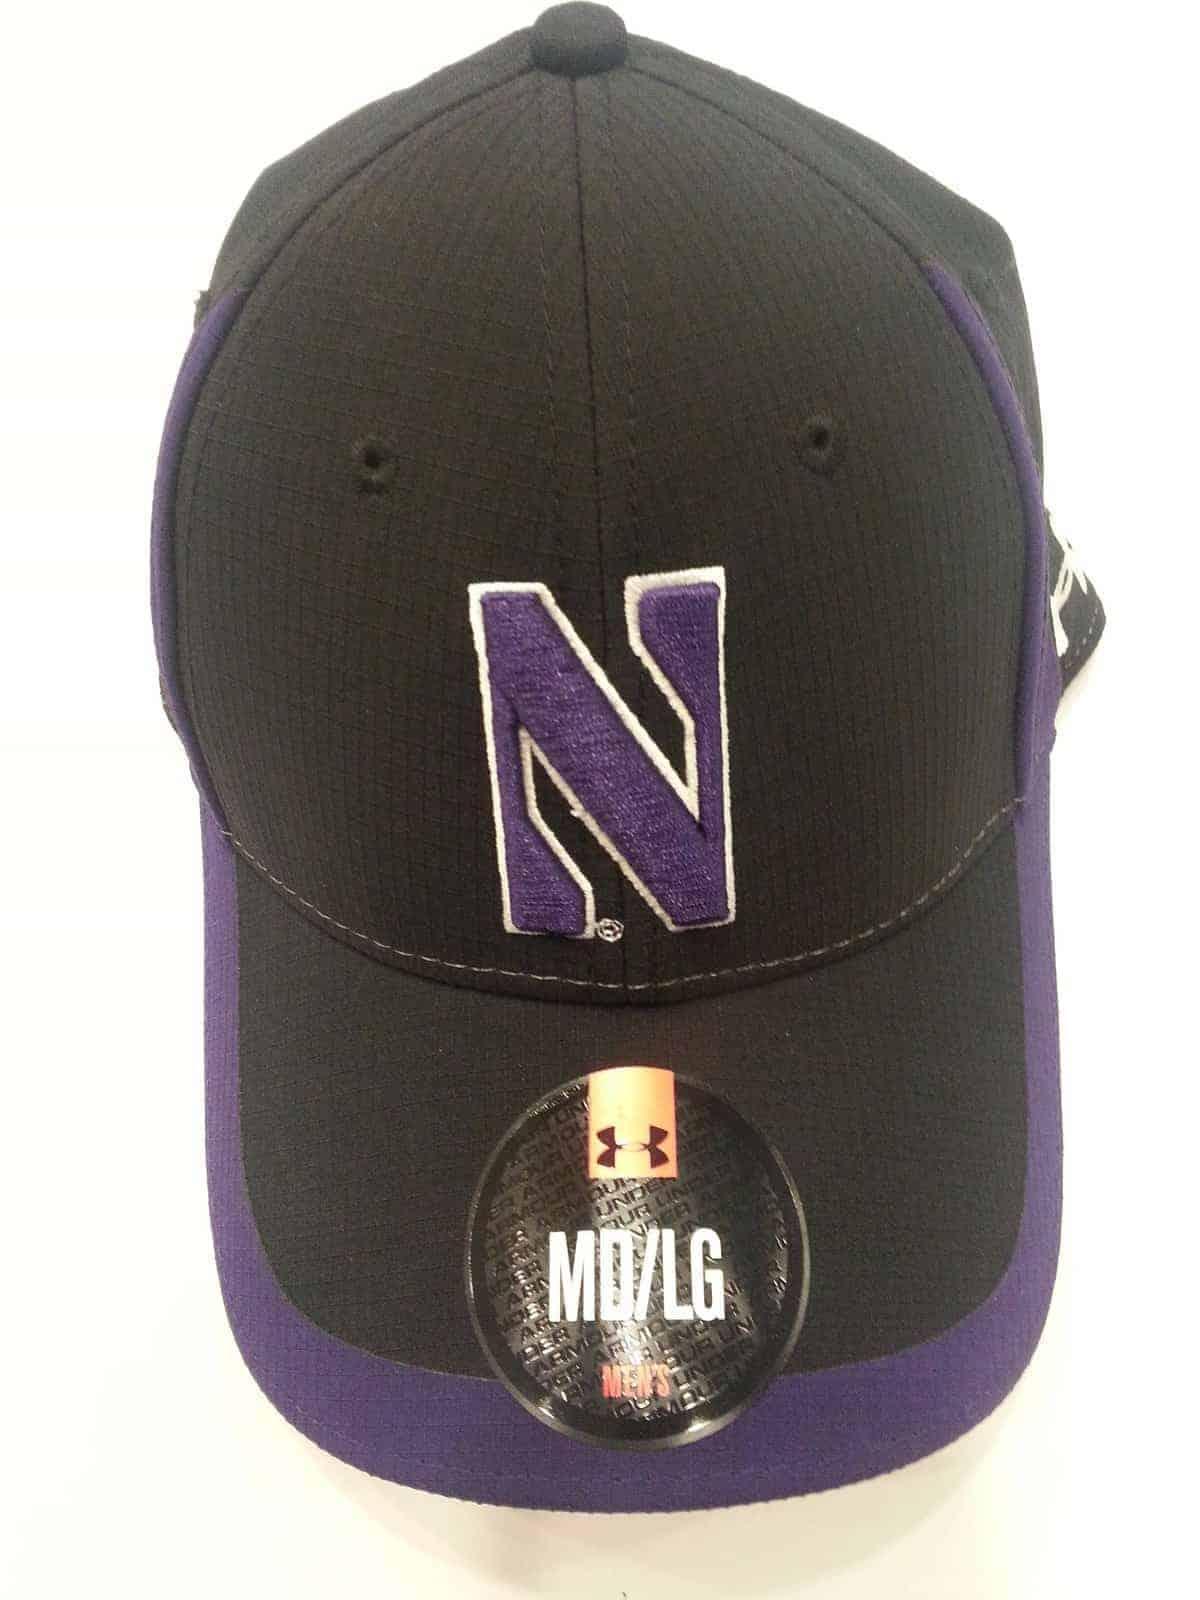 b1dbeee980f Northwestern University Wildcats Under Armour Black Purple Flex-Fit Hat  with Stylized N Design